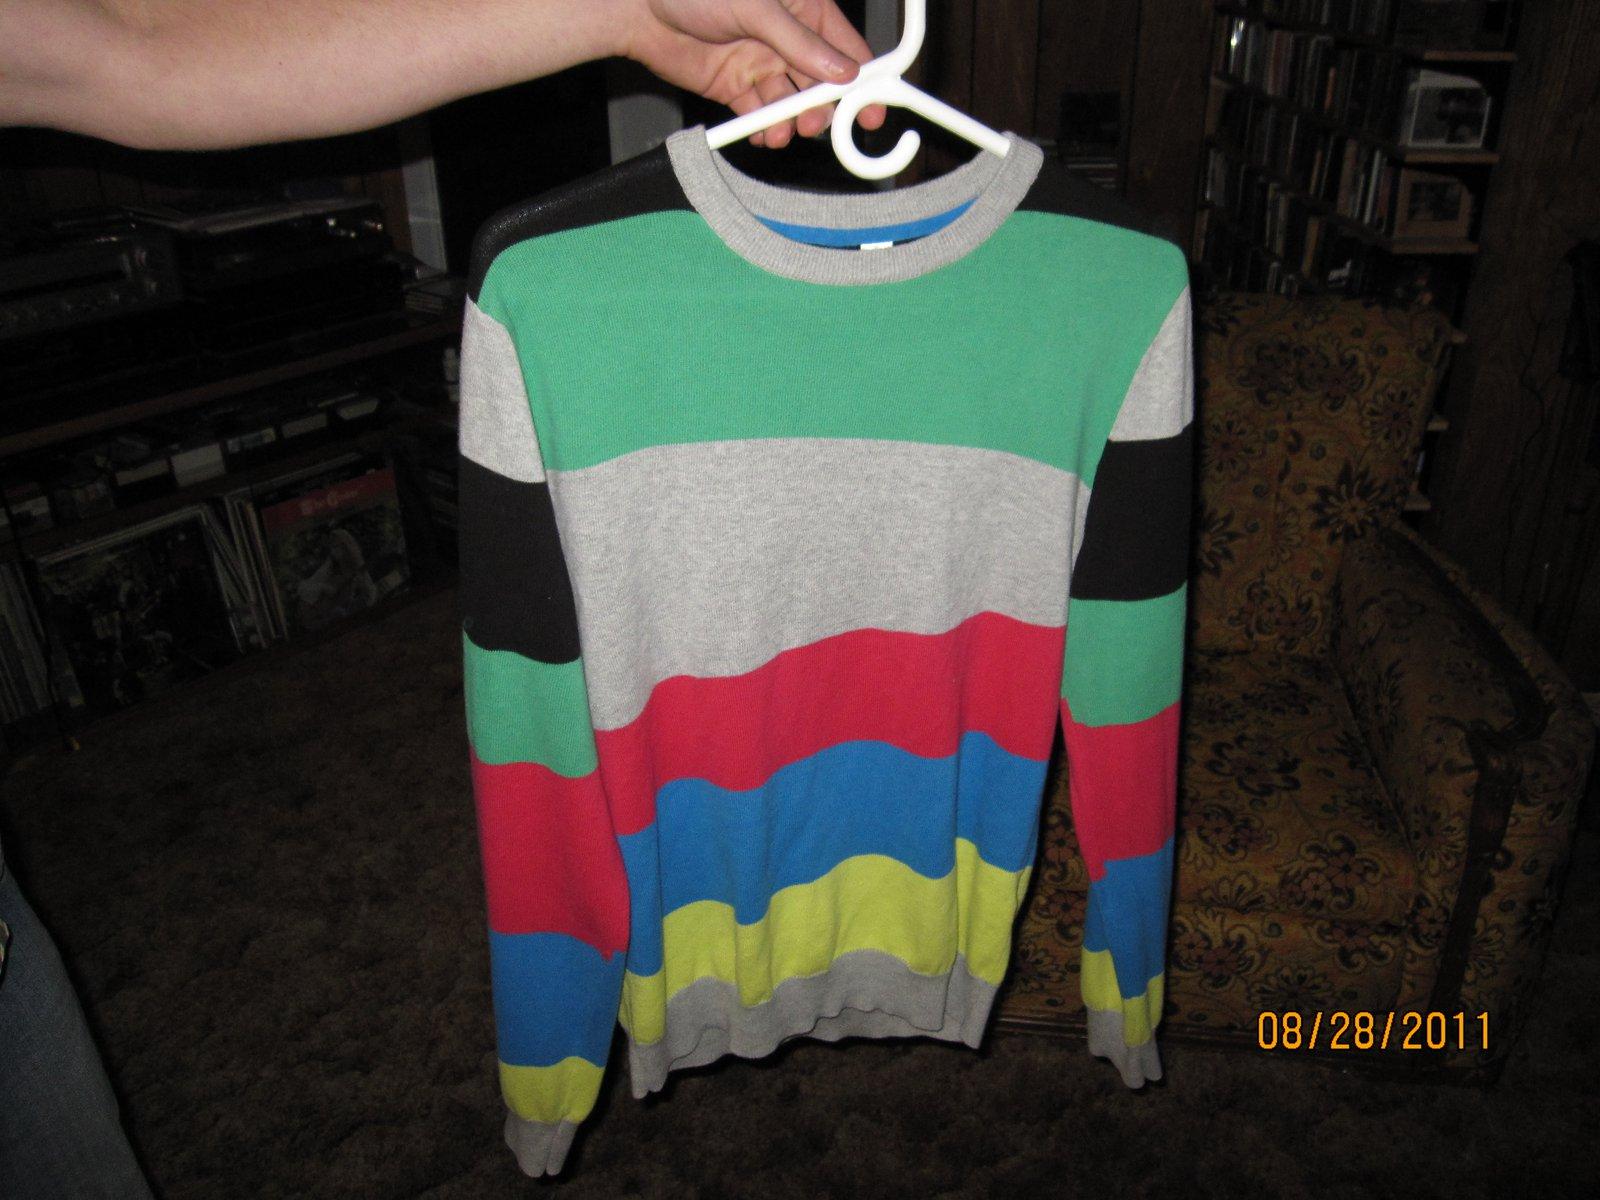 Mac miller - senior skip day ( the sweater) - 2 of 2